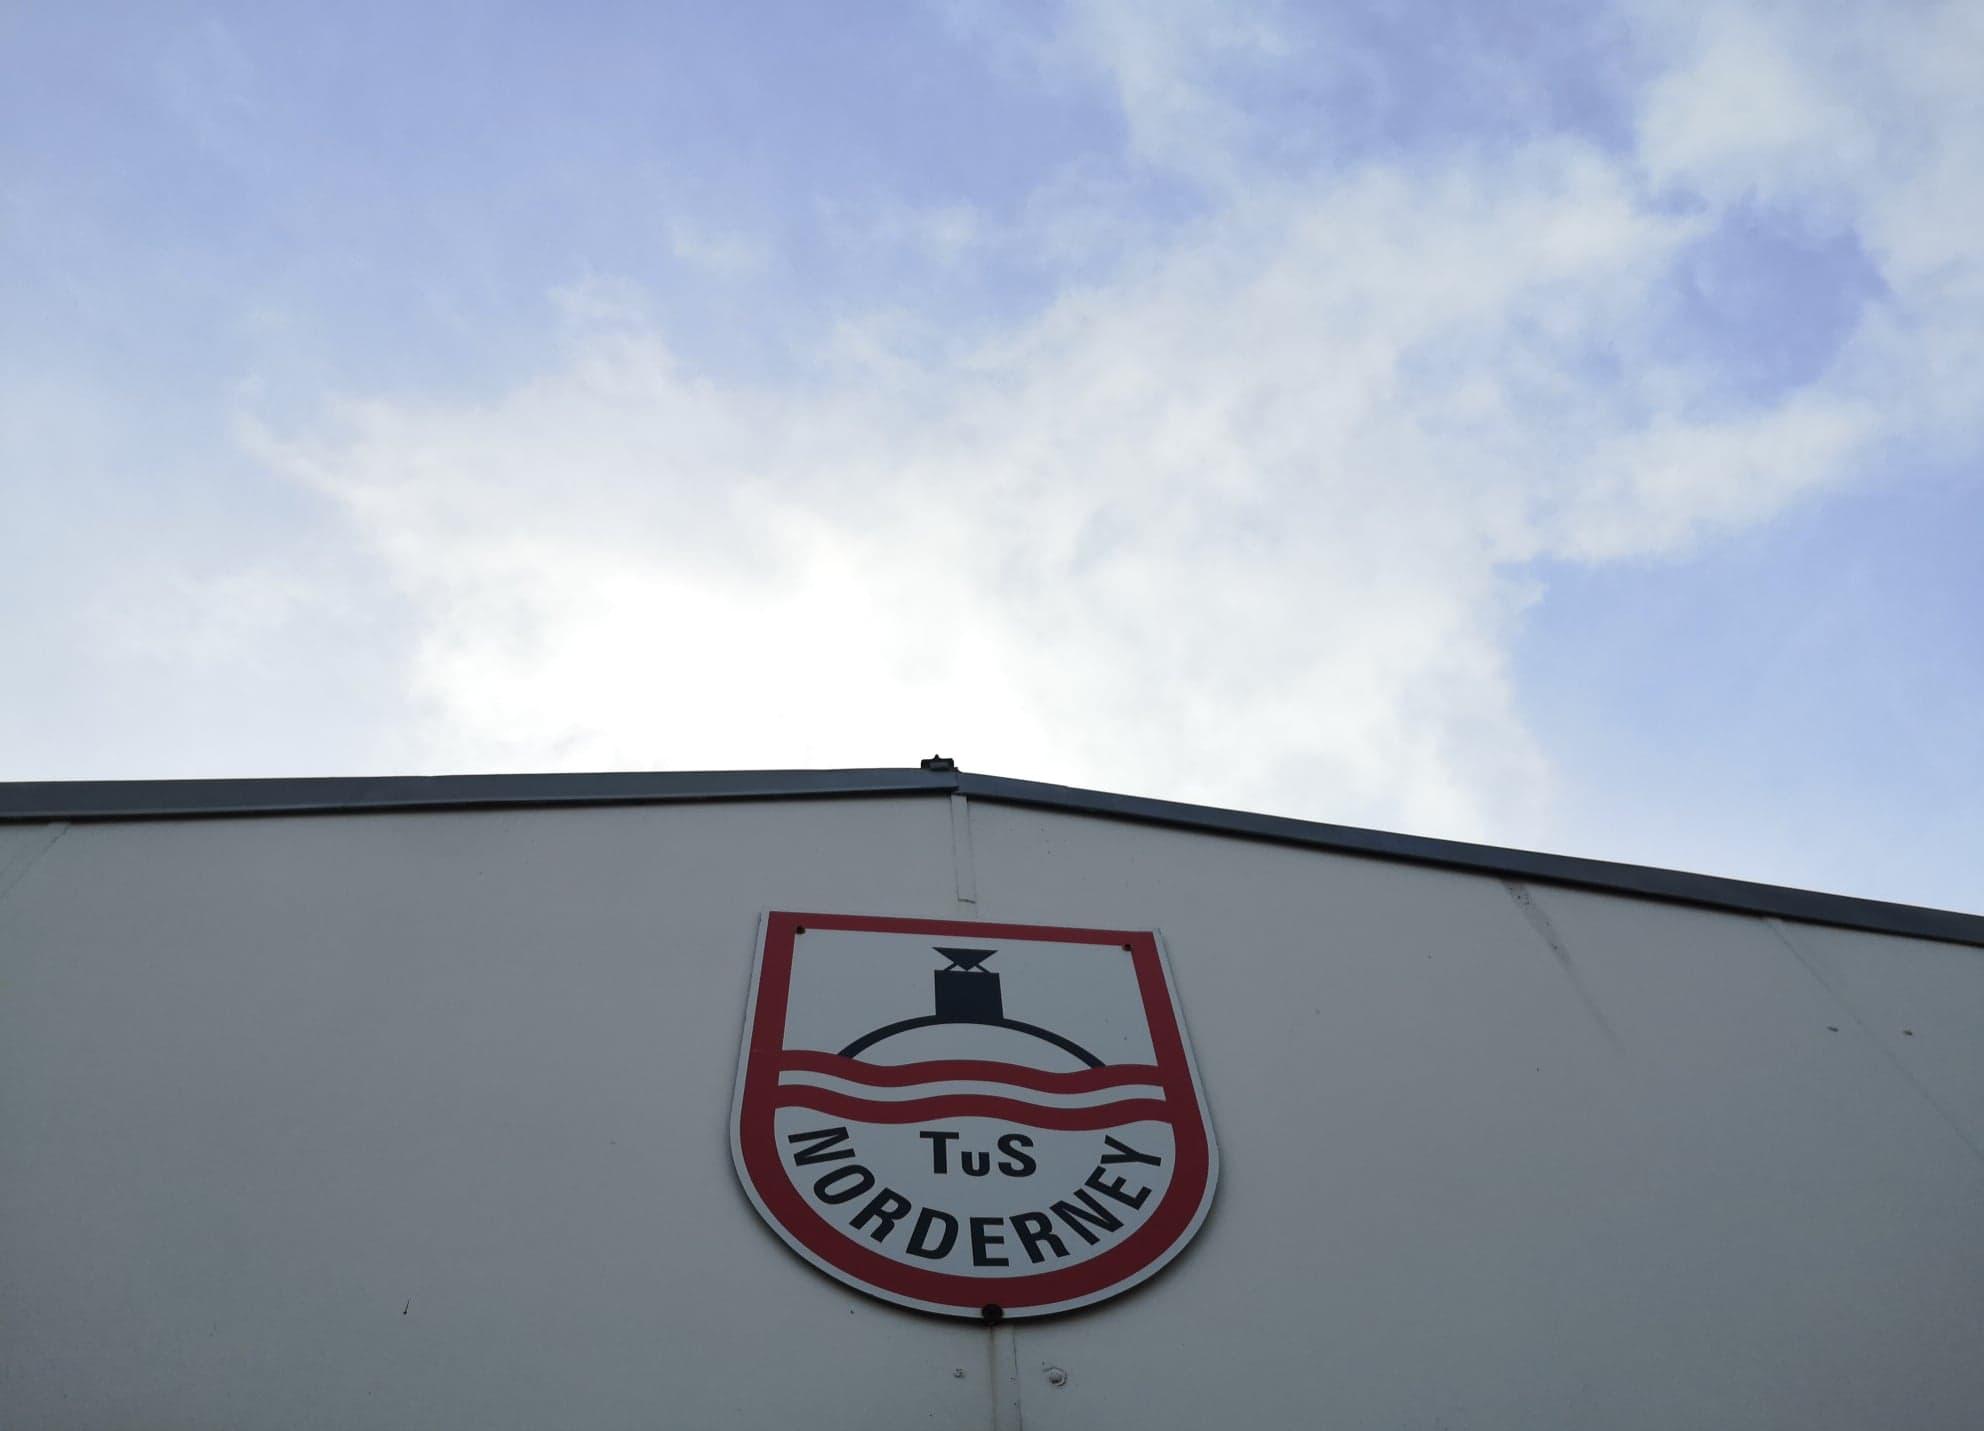 Tus Norderney, Sportverein Norderney, Inselblogger Norderney